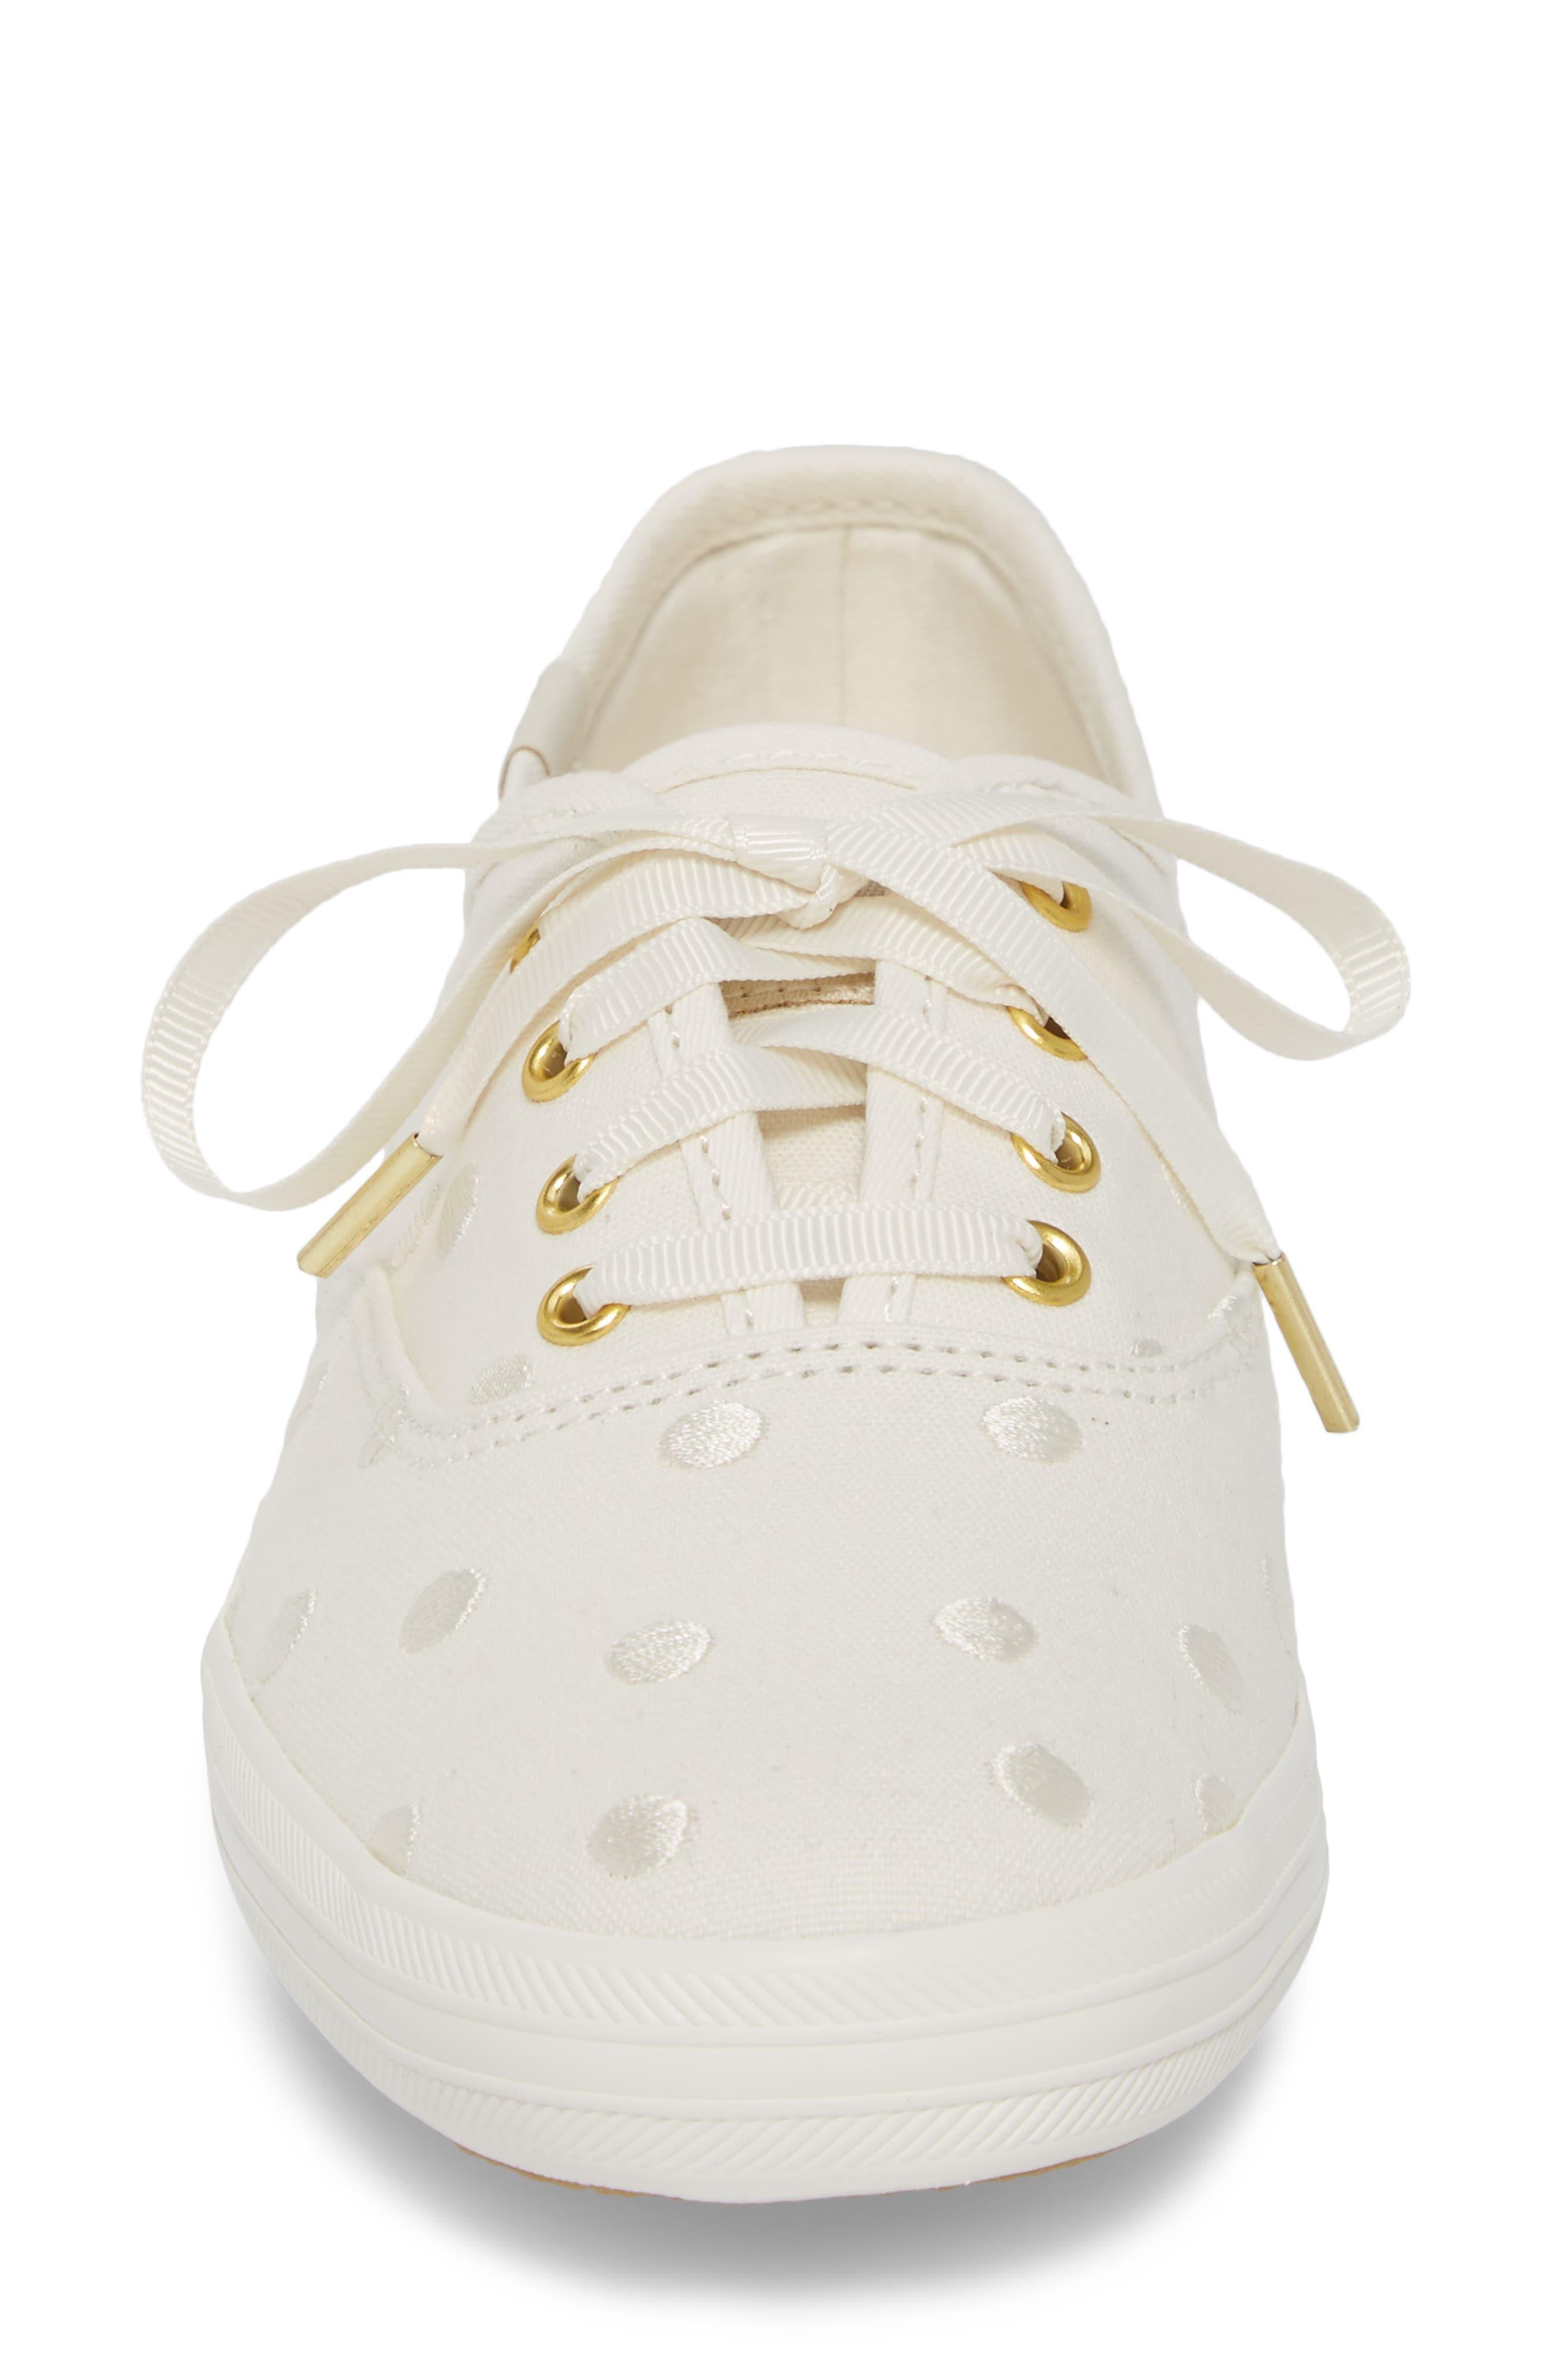 KEDS<SUP>®</SUP> FOR KATE SPADE NEW YORK, champion dancing dot sneaker, Alternate thumbnail 4, color, WHITE